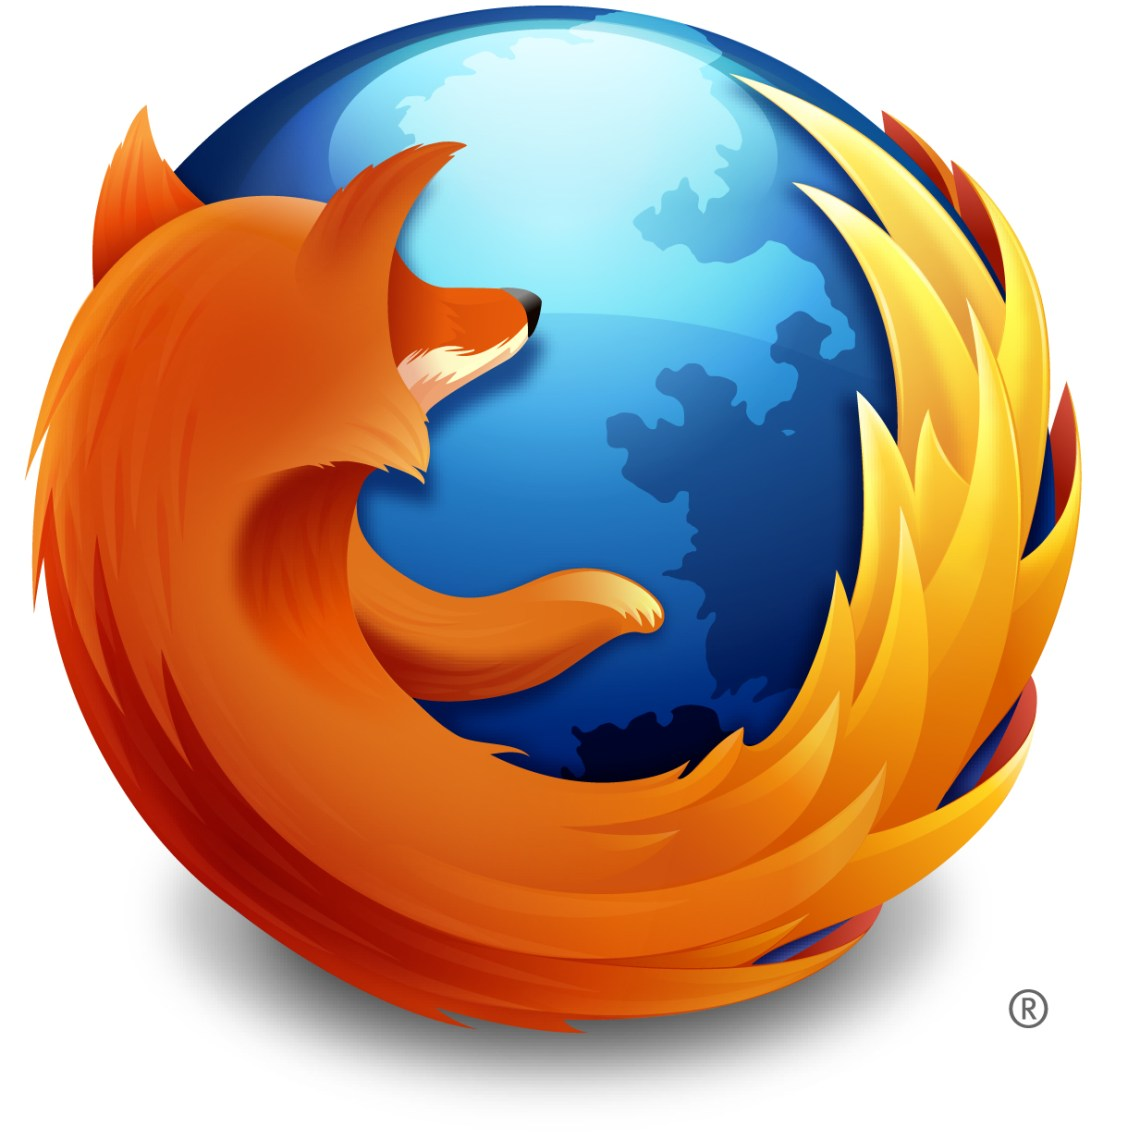 Mozilla firefox download latest version filehippo alifmedia image result for mozilla firefox download latest version filehippo gumiabroncs Choice Image